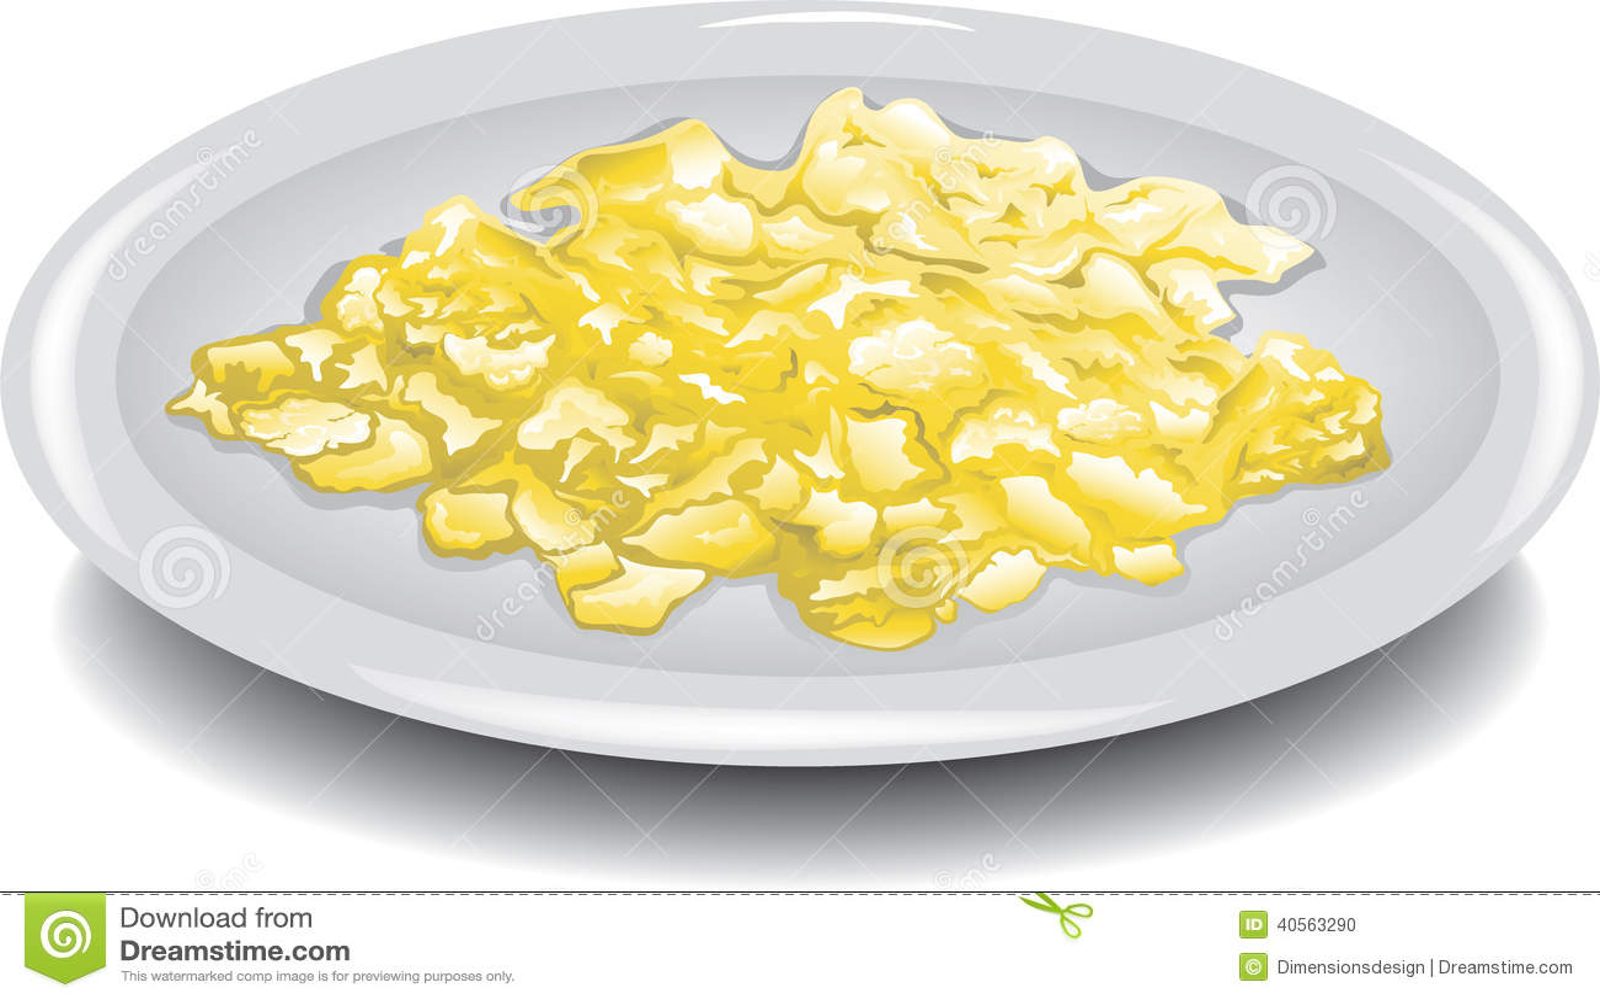 Scrambled Eggs Stock Vector - Image: 40563290